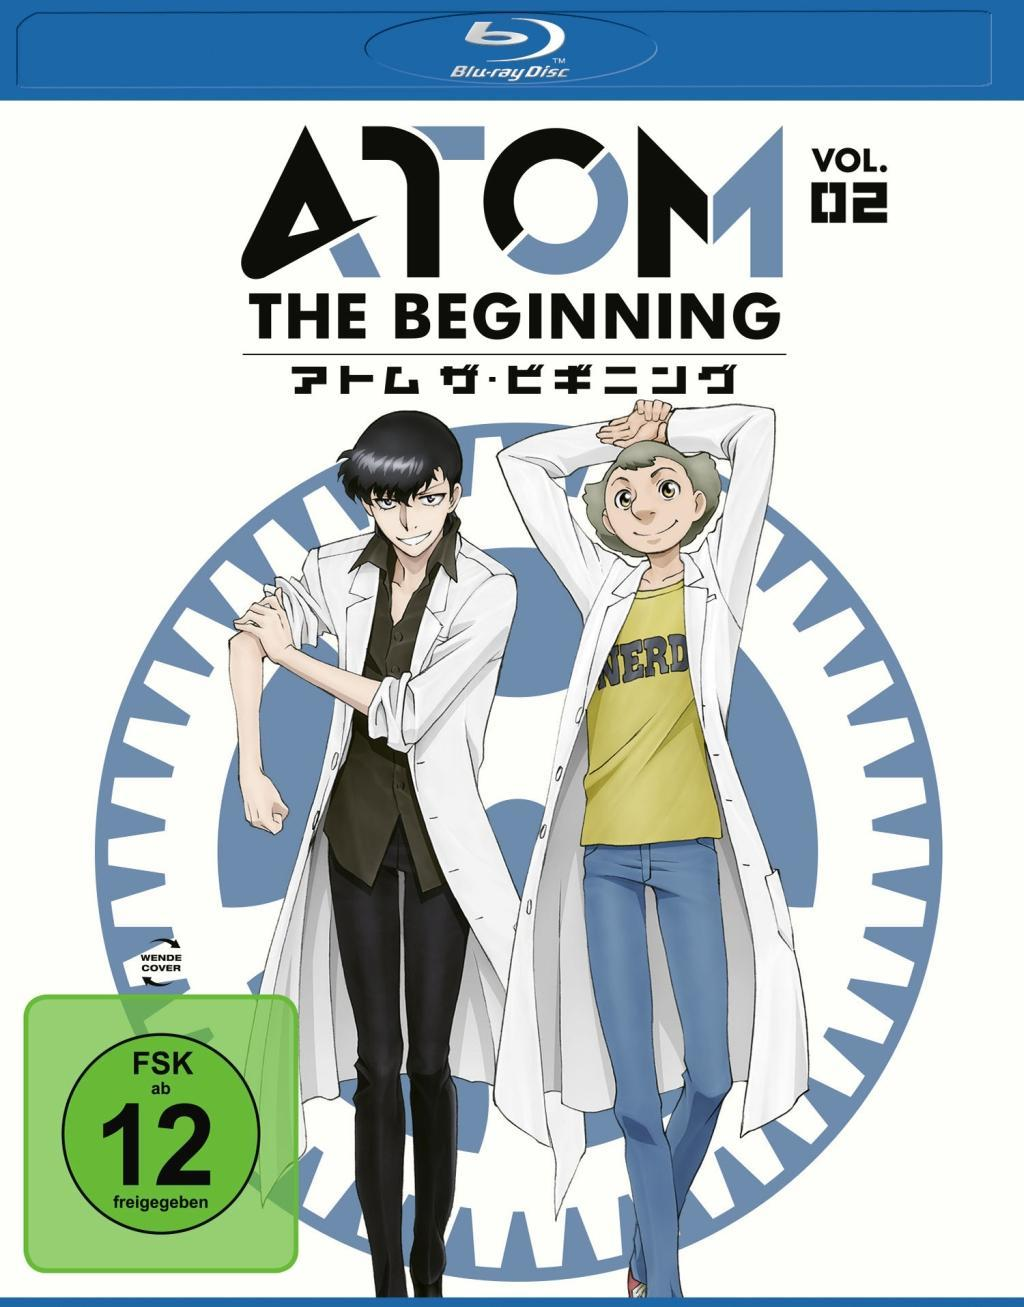 Atom the Beginning Vol. 2 BD  TatsuoMotohiro Sato  Blu-ray Disc  Deutsch  2018